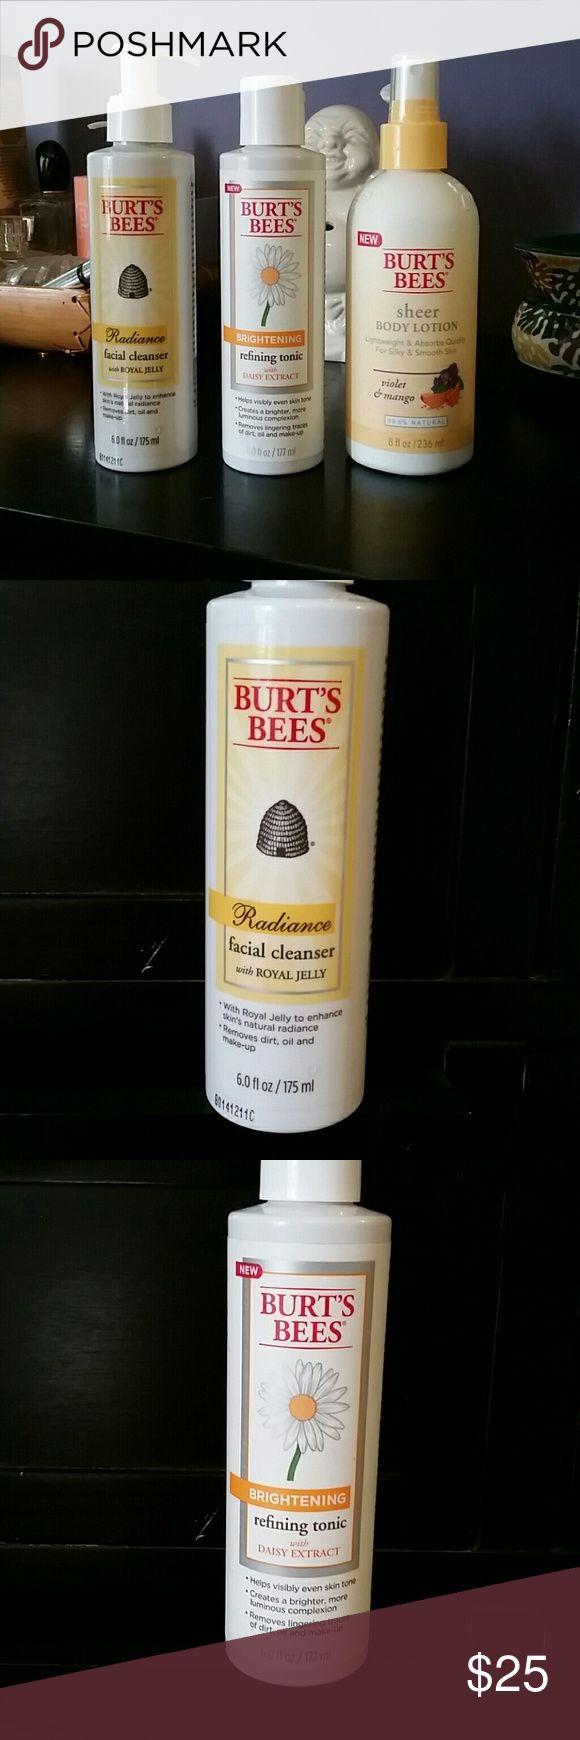 New Burt's Bees Facial cleanser + Refining tonic. Burt's Bees Radiance facial cleanser 6 oz. Brightening refining tonic 6 oz. Sheer body lotion, Violet + Mango. 8 oz. Burt's Bees Other